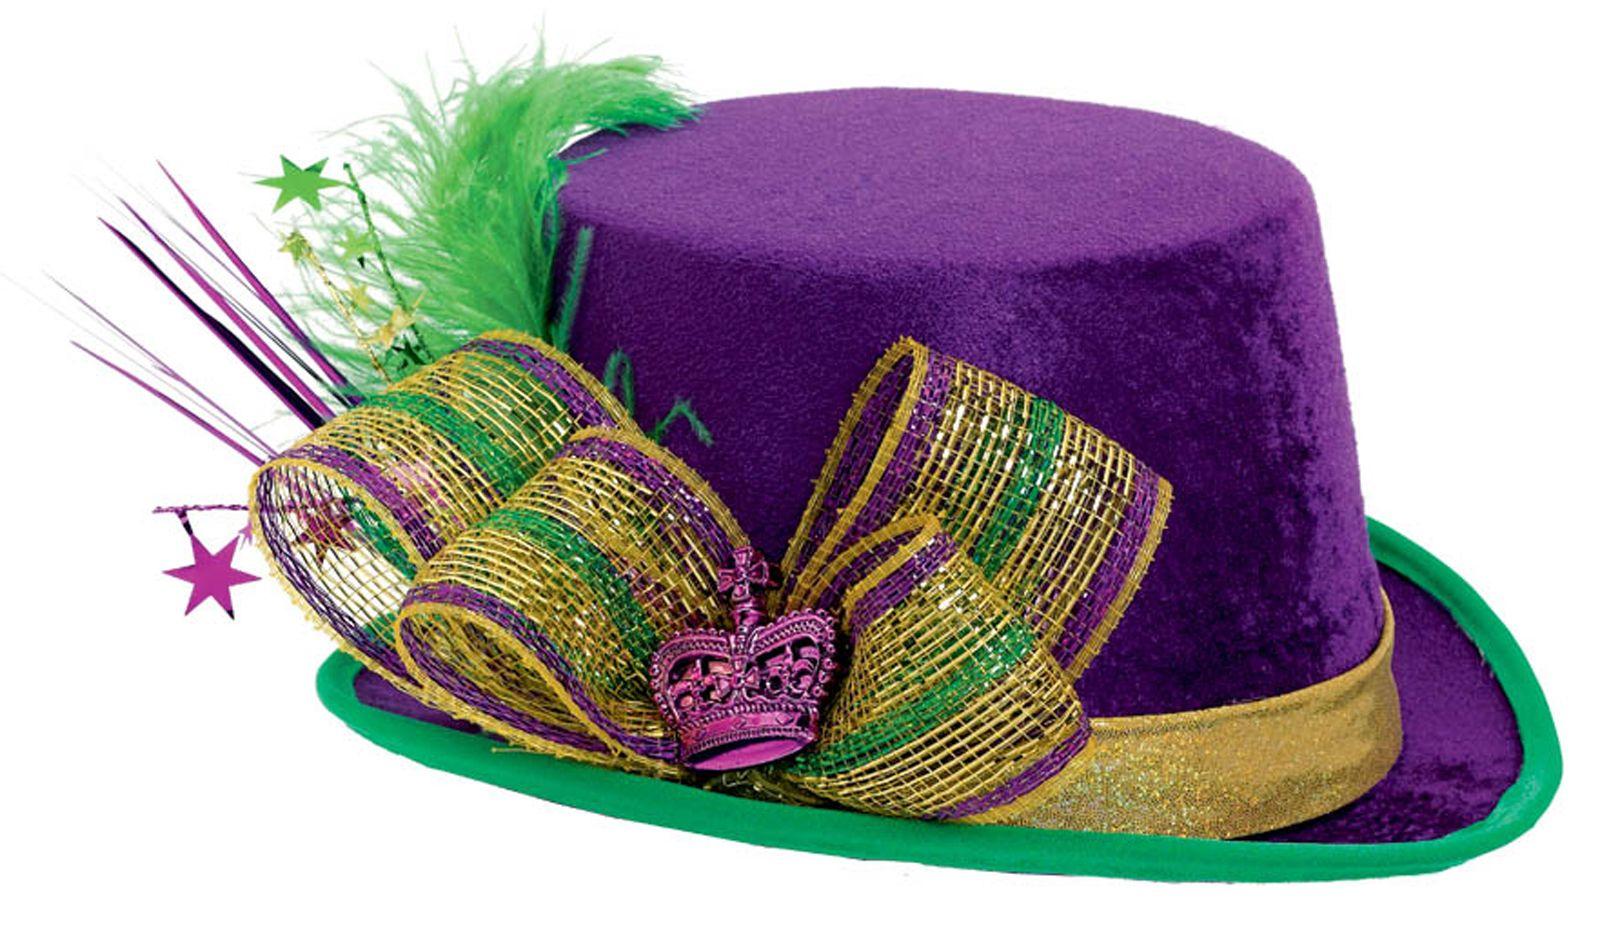 1687322.jpg (1600×948) | Mardi Gras Hats | Pinterest